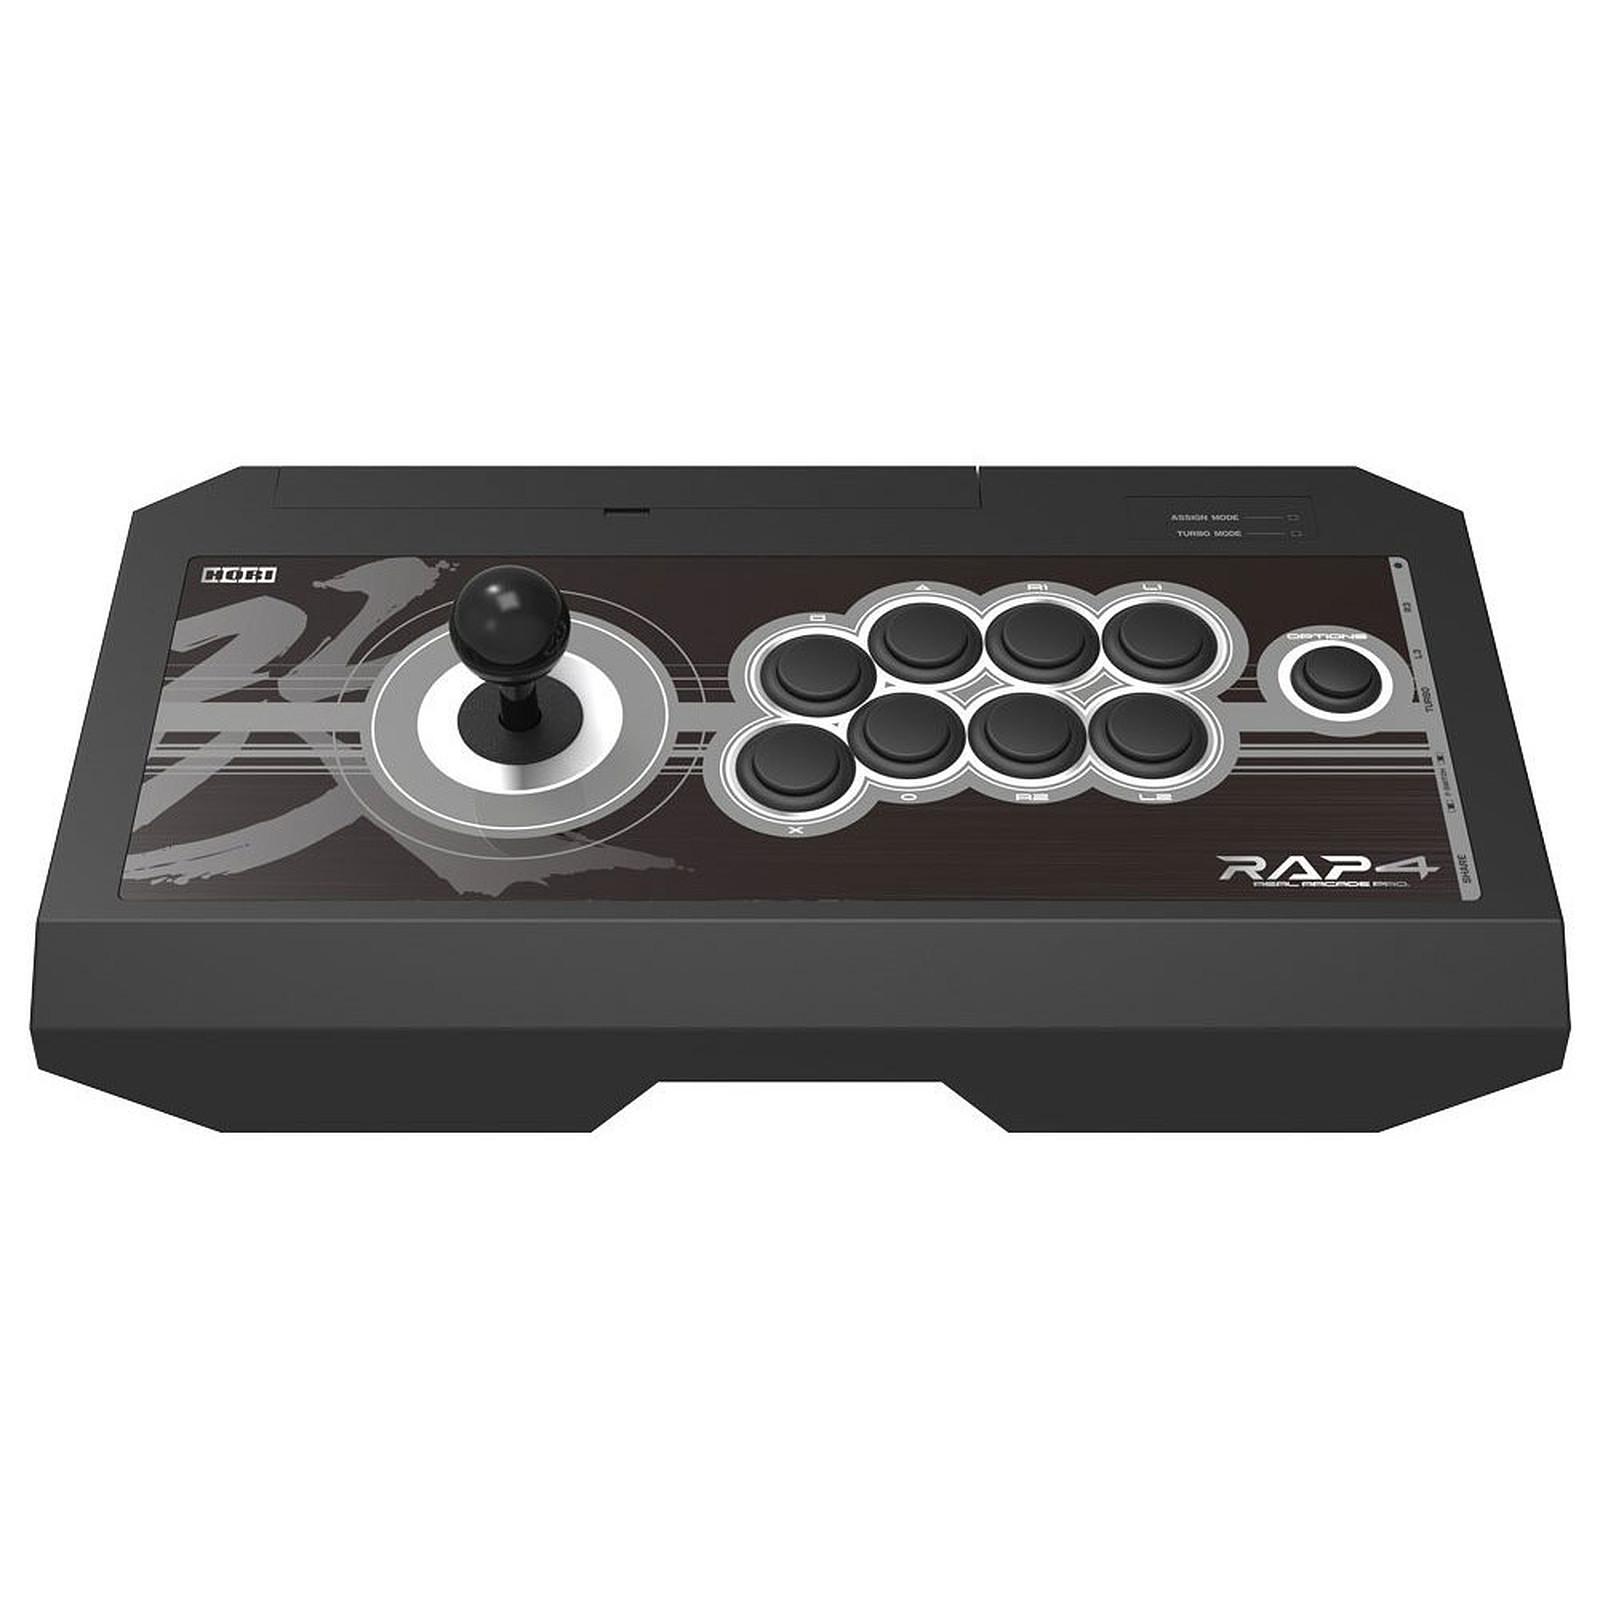 Hori Real Arcade Pro 4 Kai (PS3/PS4/PC)